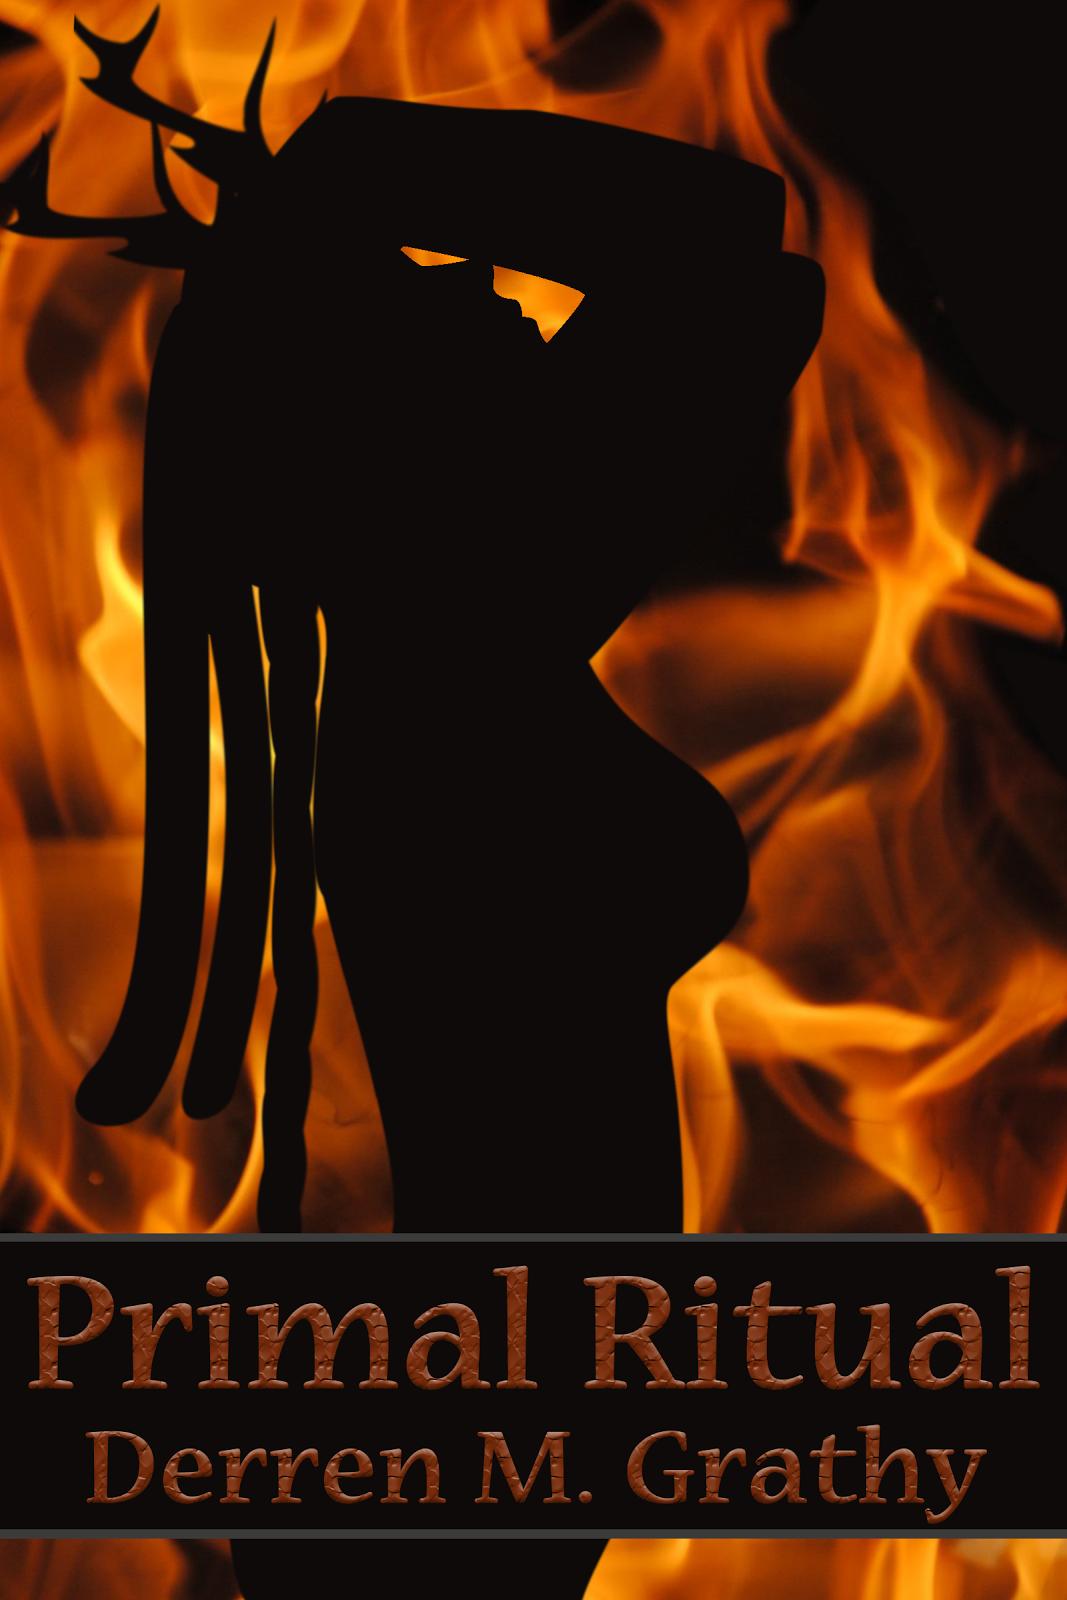 Primal Ritual